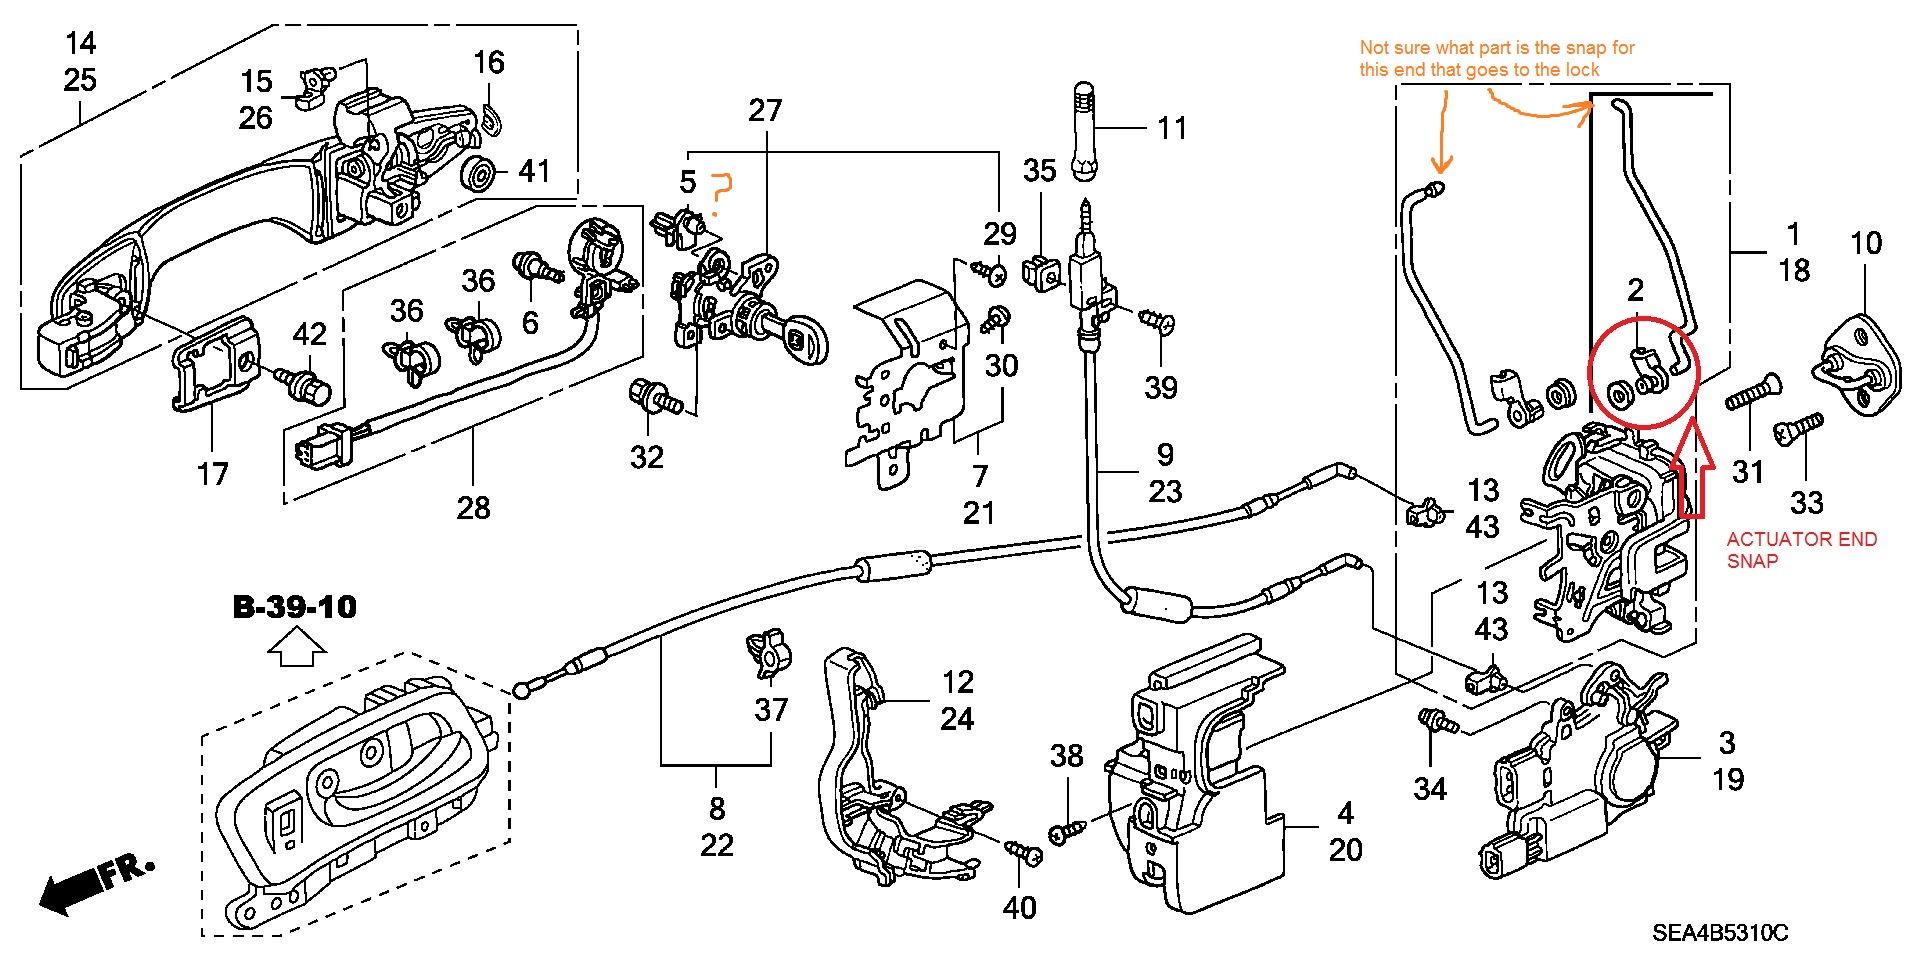 F 179 Diy Pass Door Lock Actuator Replacement W Pics